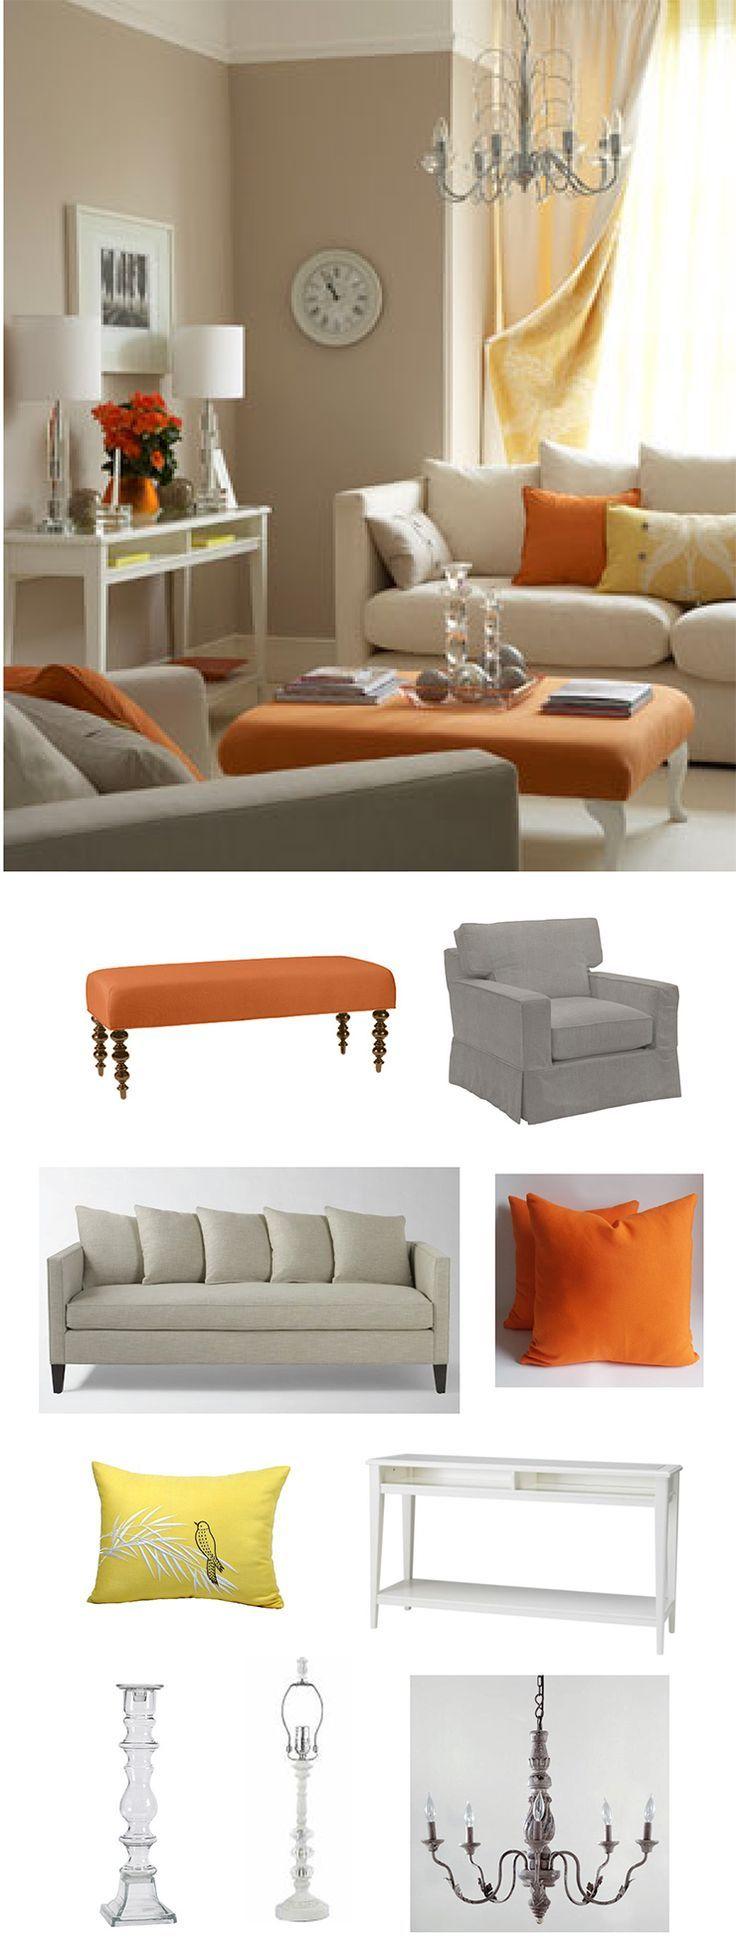 17 best ideas about orange living rooms on pinterest | orange